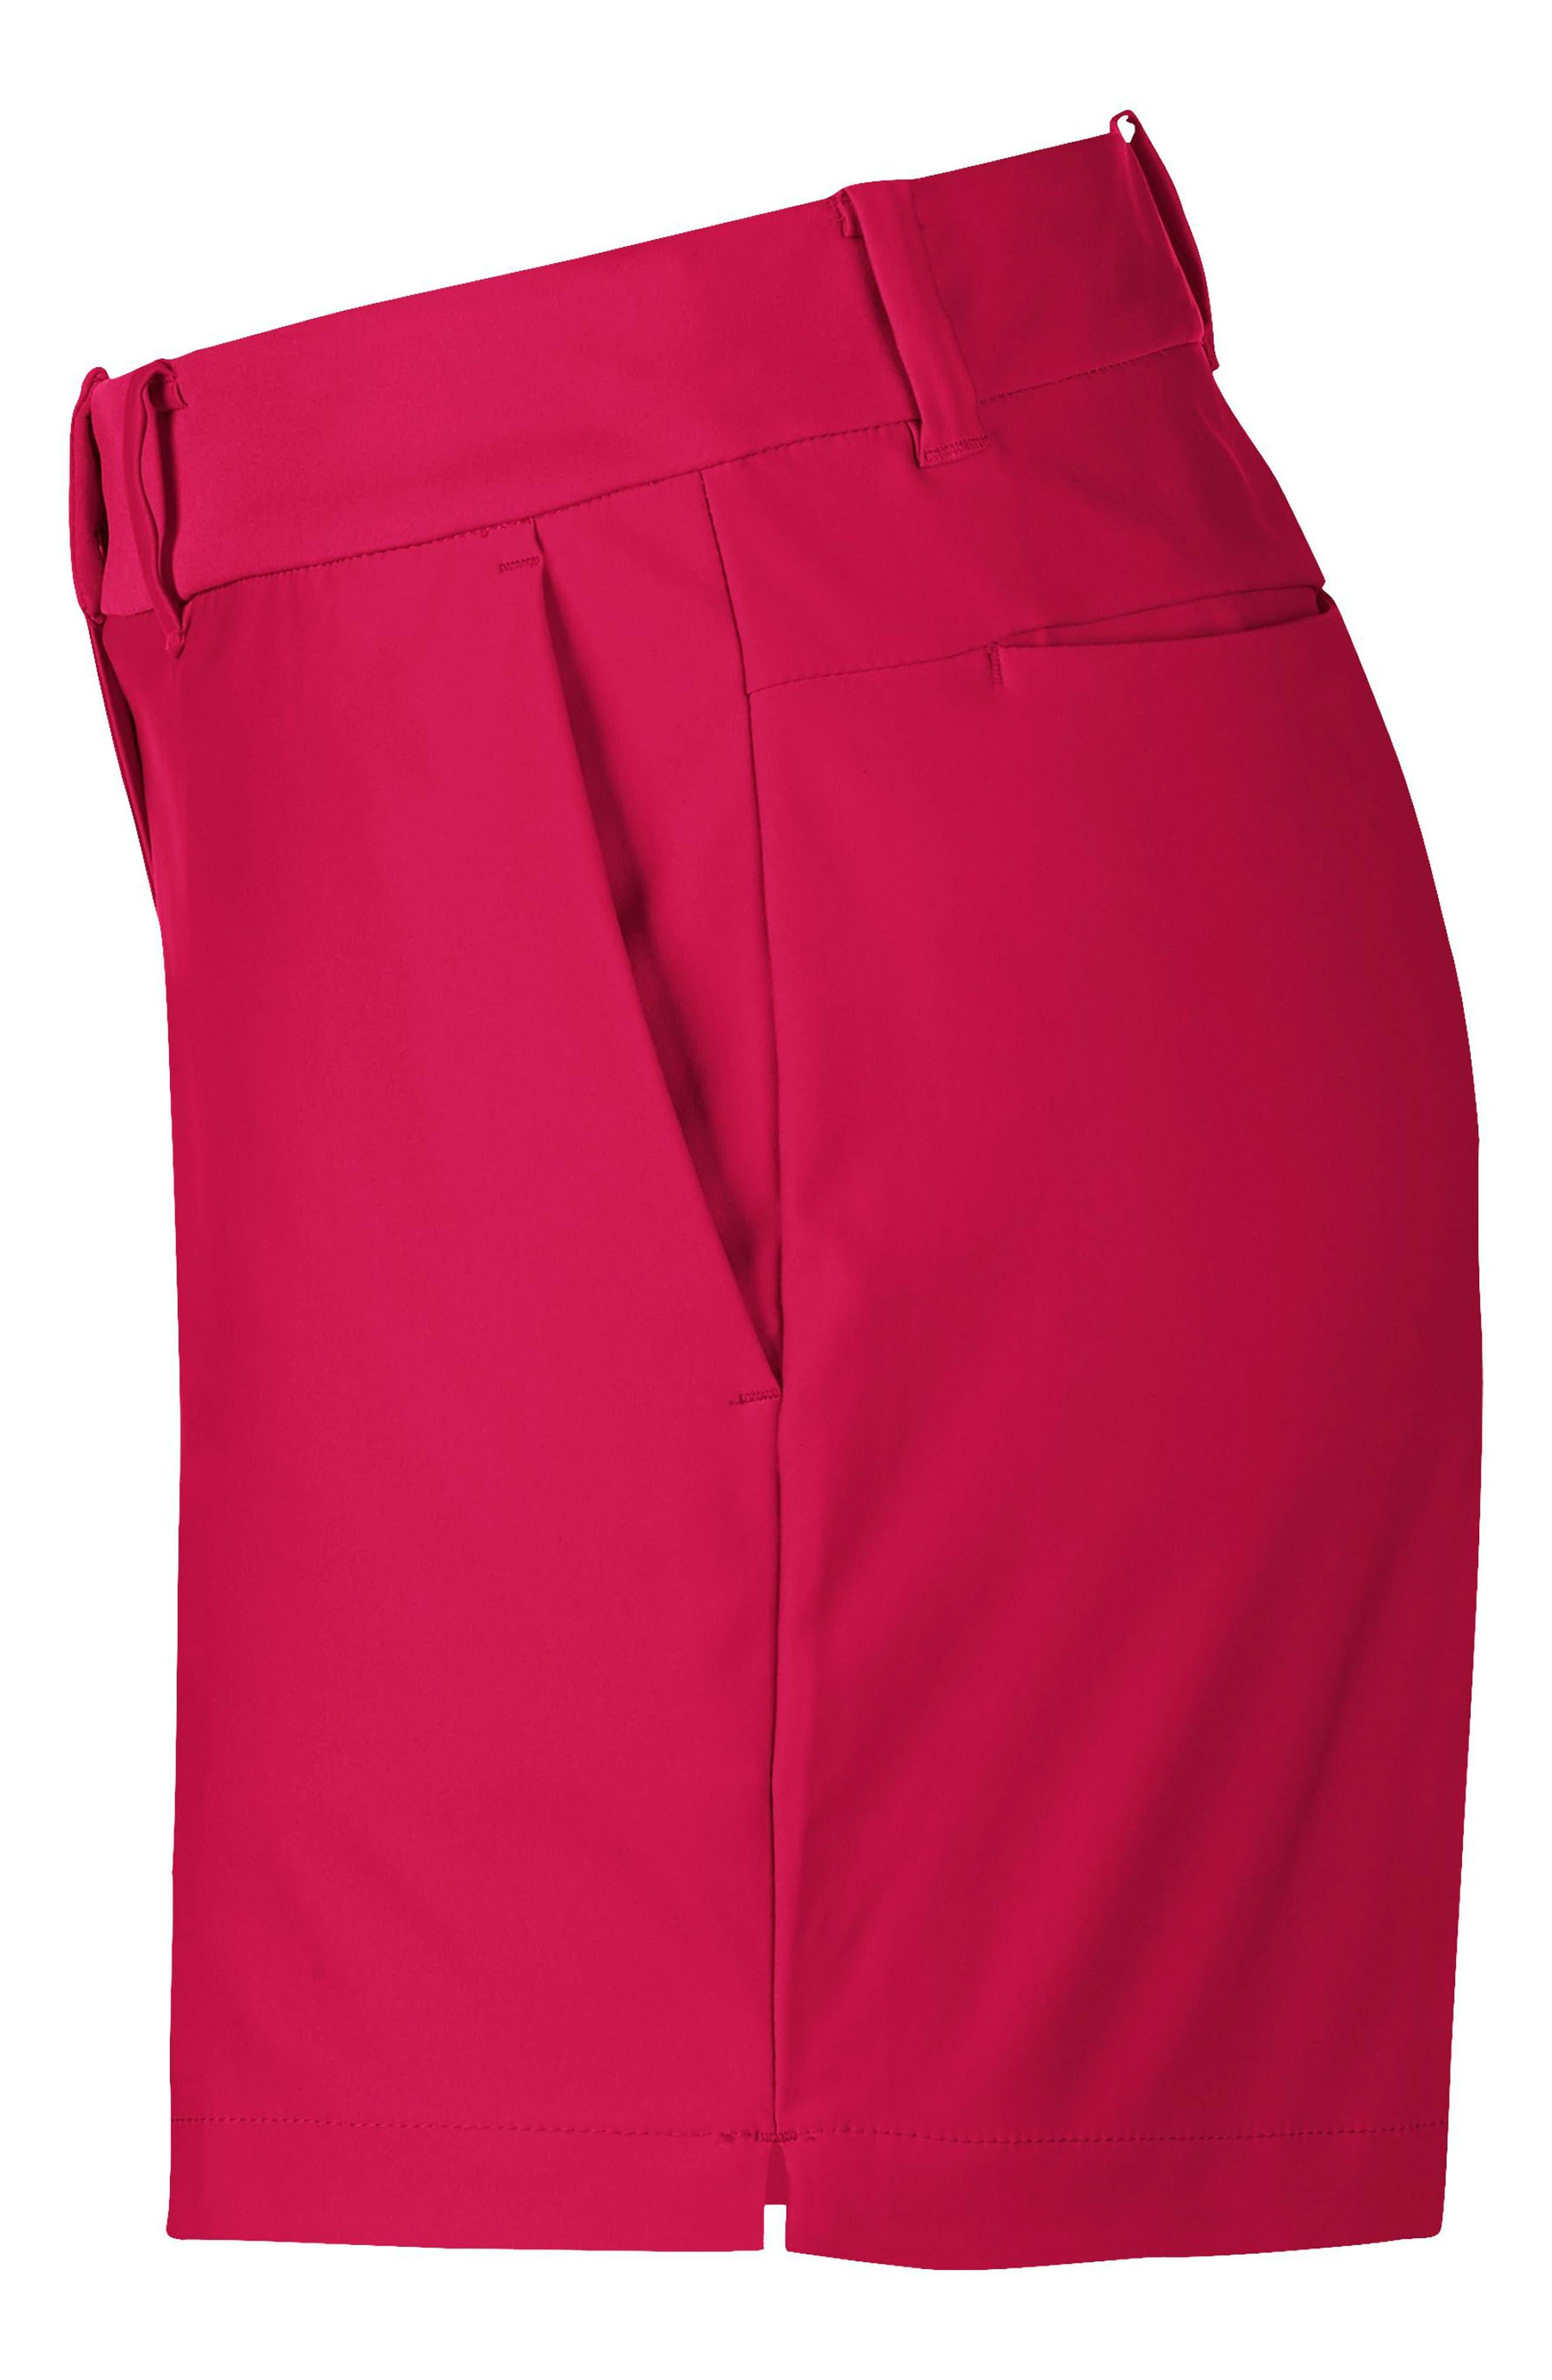 Flex Golf Shorts,                             Alternate thumbnail 3, color,                             RUSH PINK/ RUSH PINK